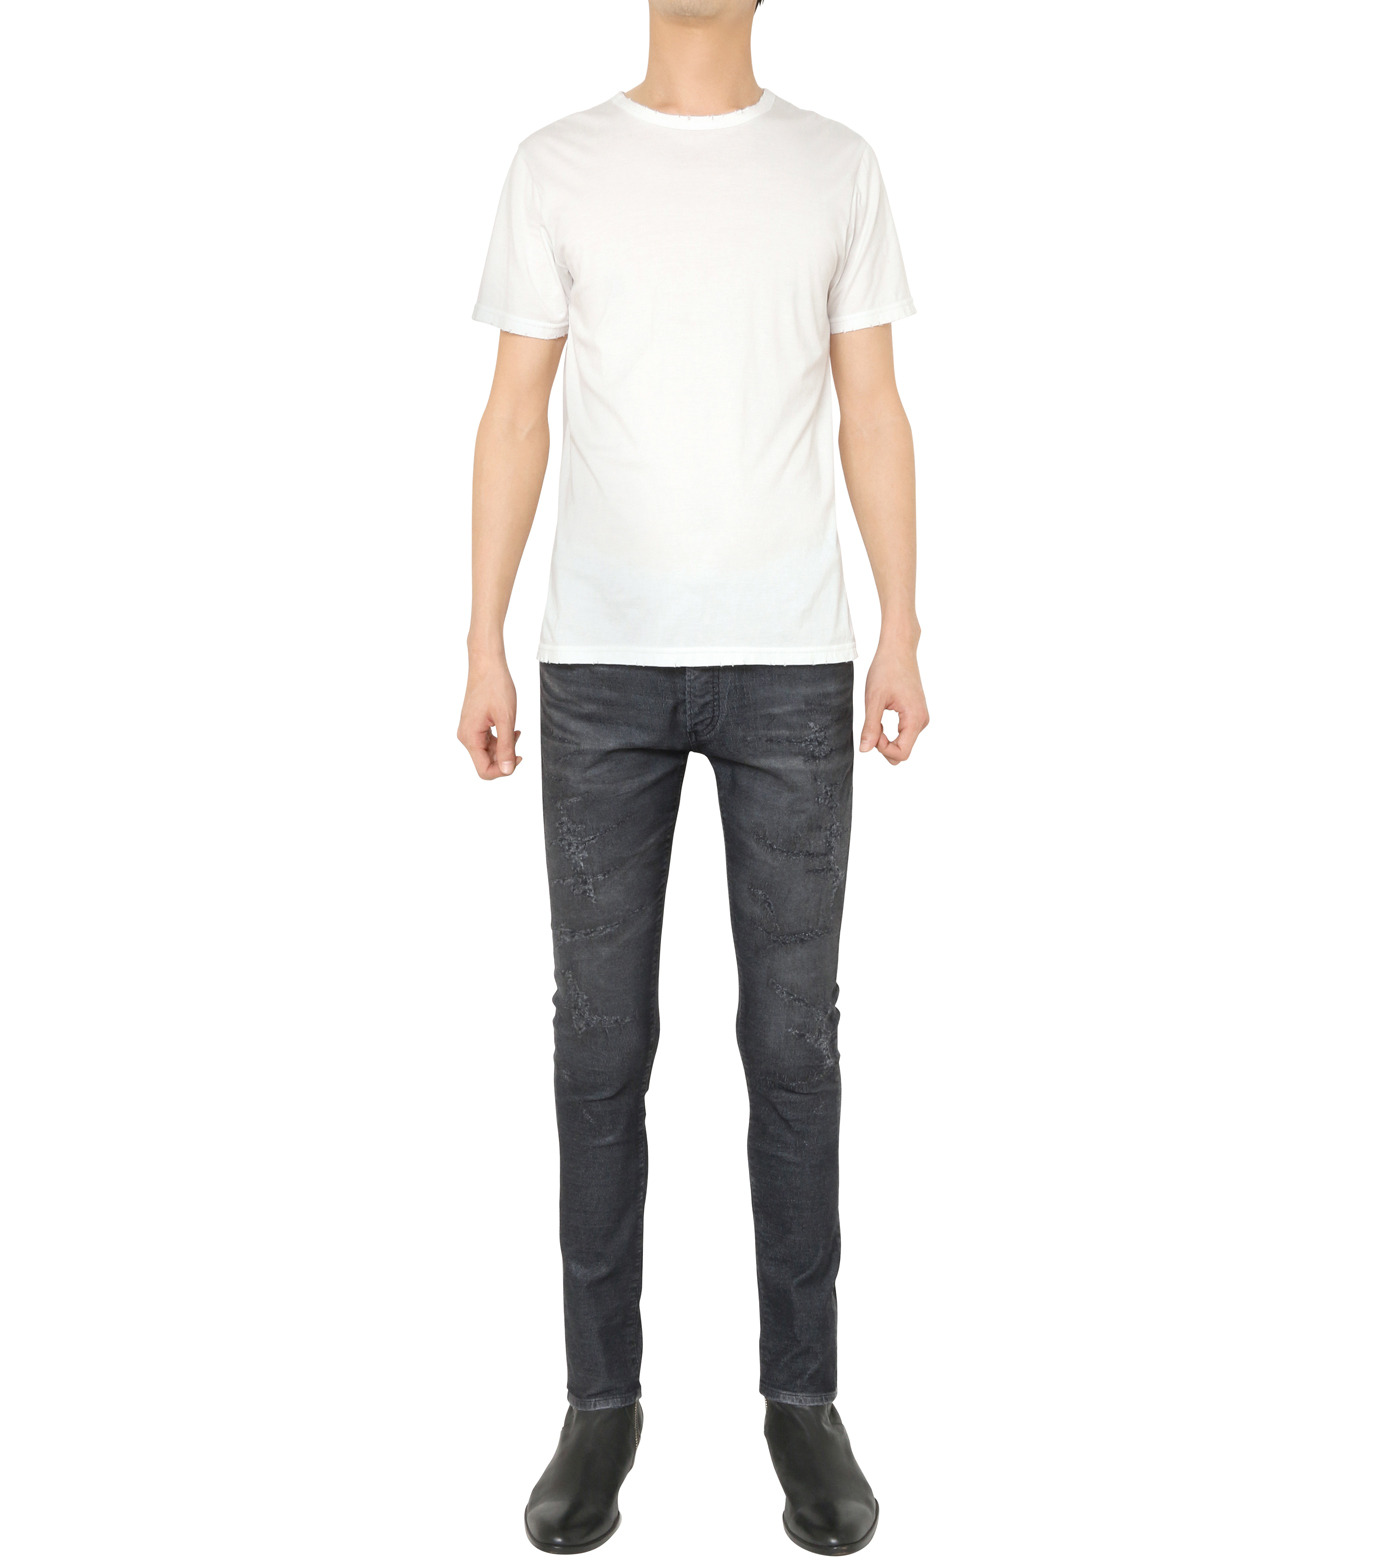 HL HEDDIE LOVU(エイチエル・エディールーヴ)のCOATING CORDUROY PANTS-GRAY(パンツ/pants)-18A98002-11 拡大詳細画像2